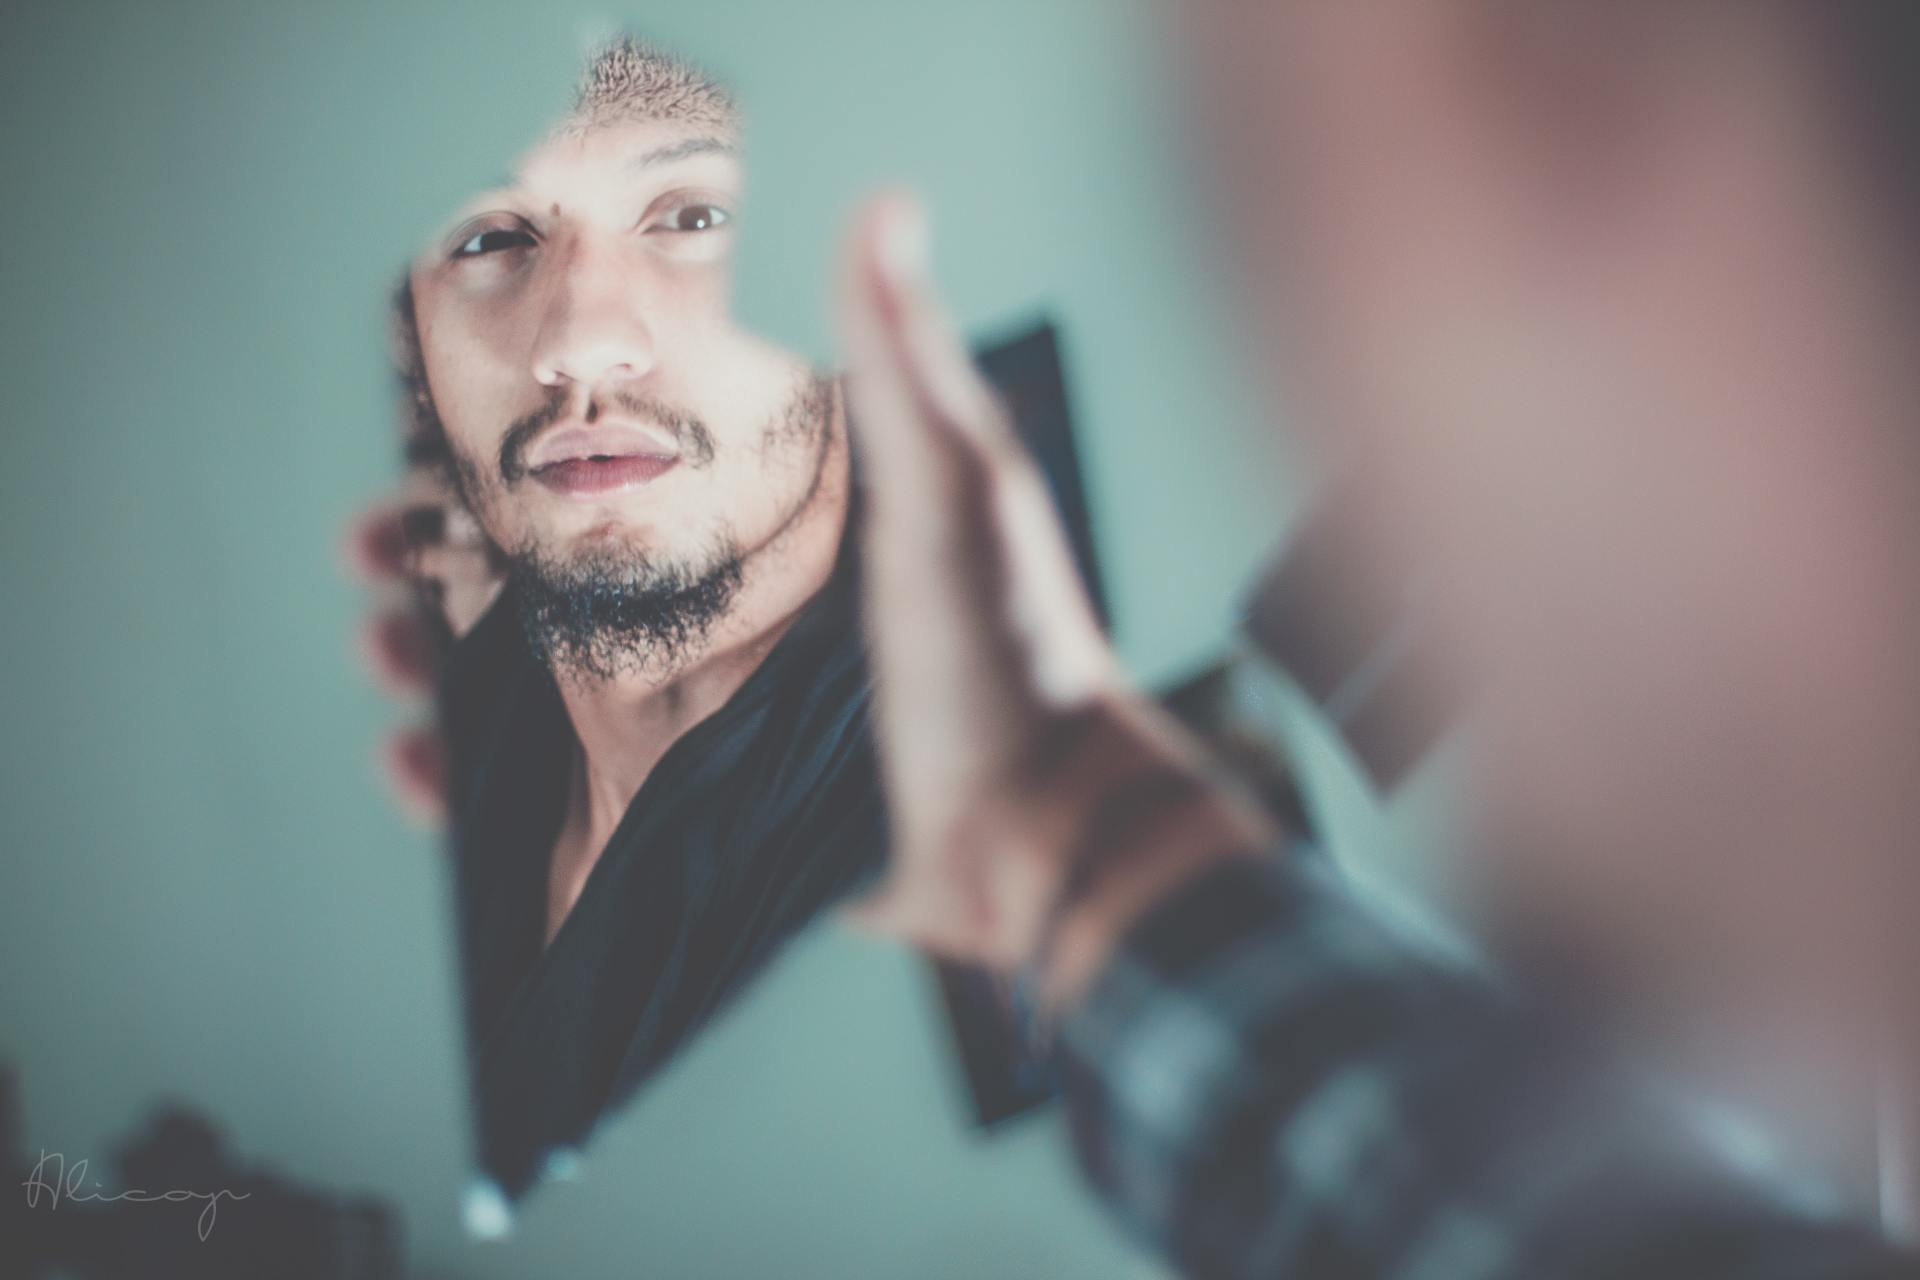 selective focus photography of man's reflection in broken mirror